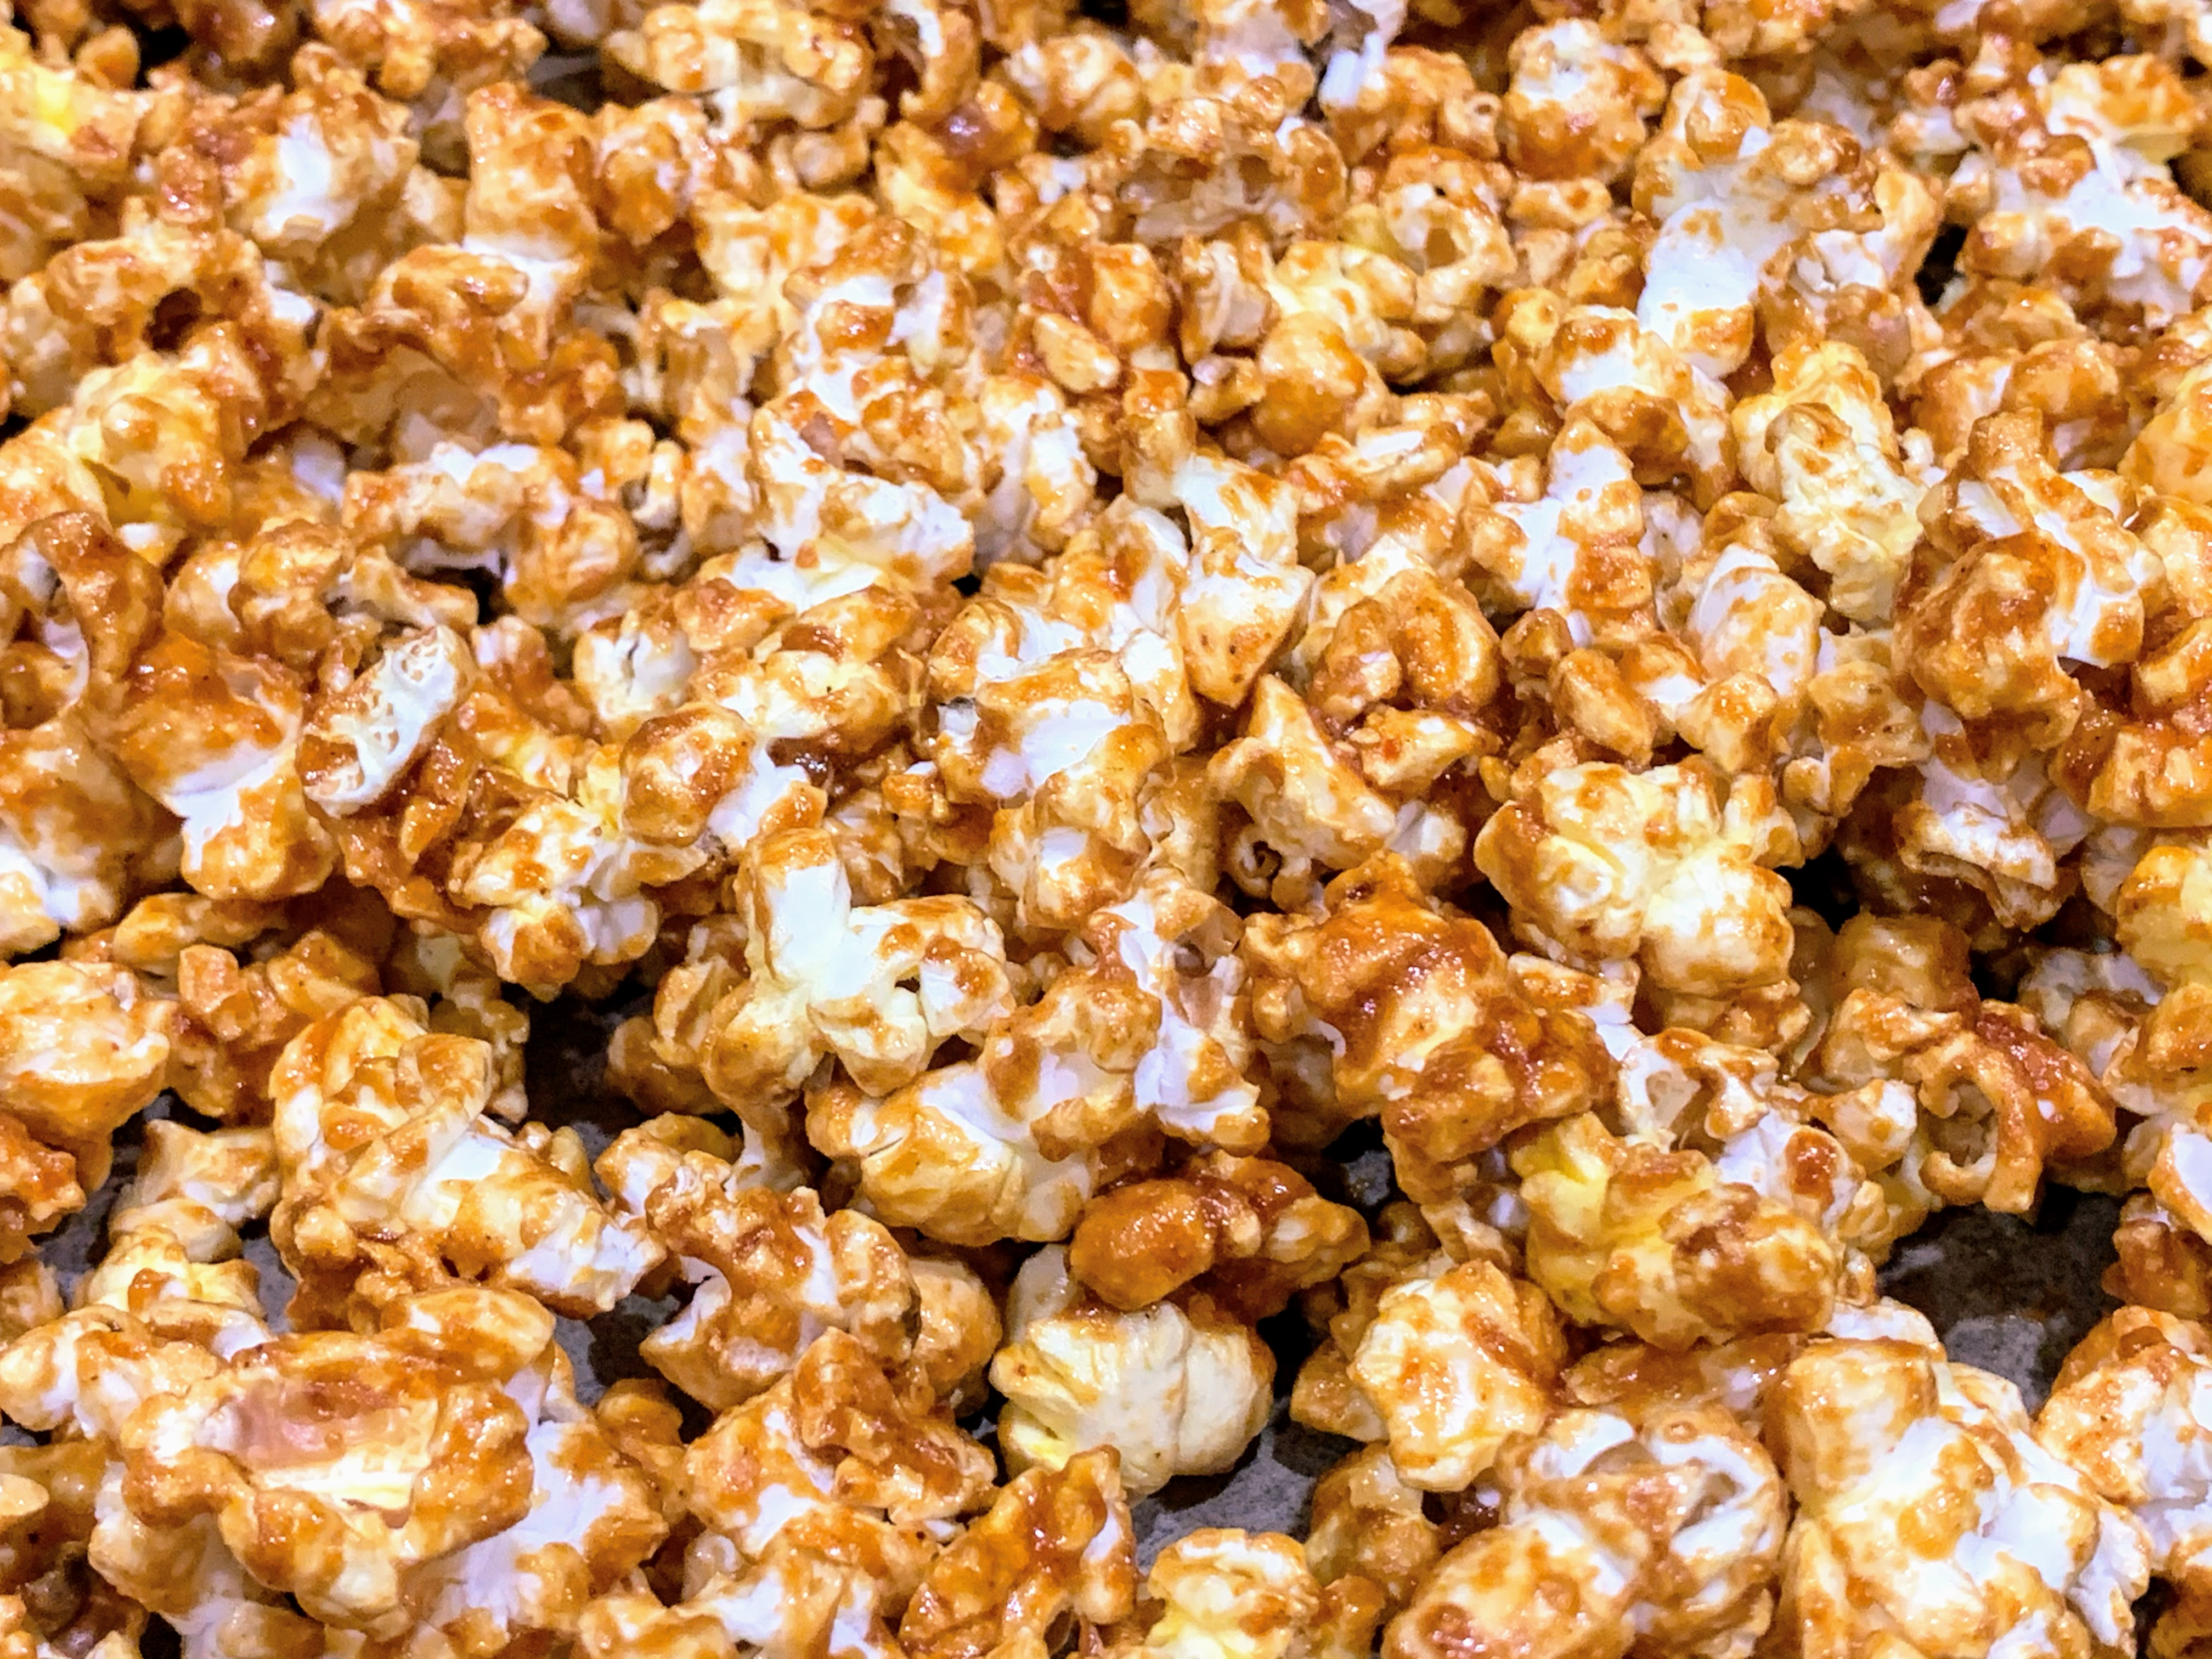 Spicy-Sweet Buffalo Popcorn Jeannine Brisson Amodeo